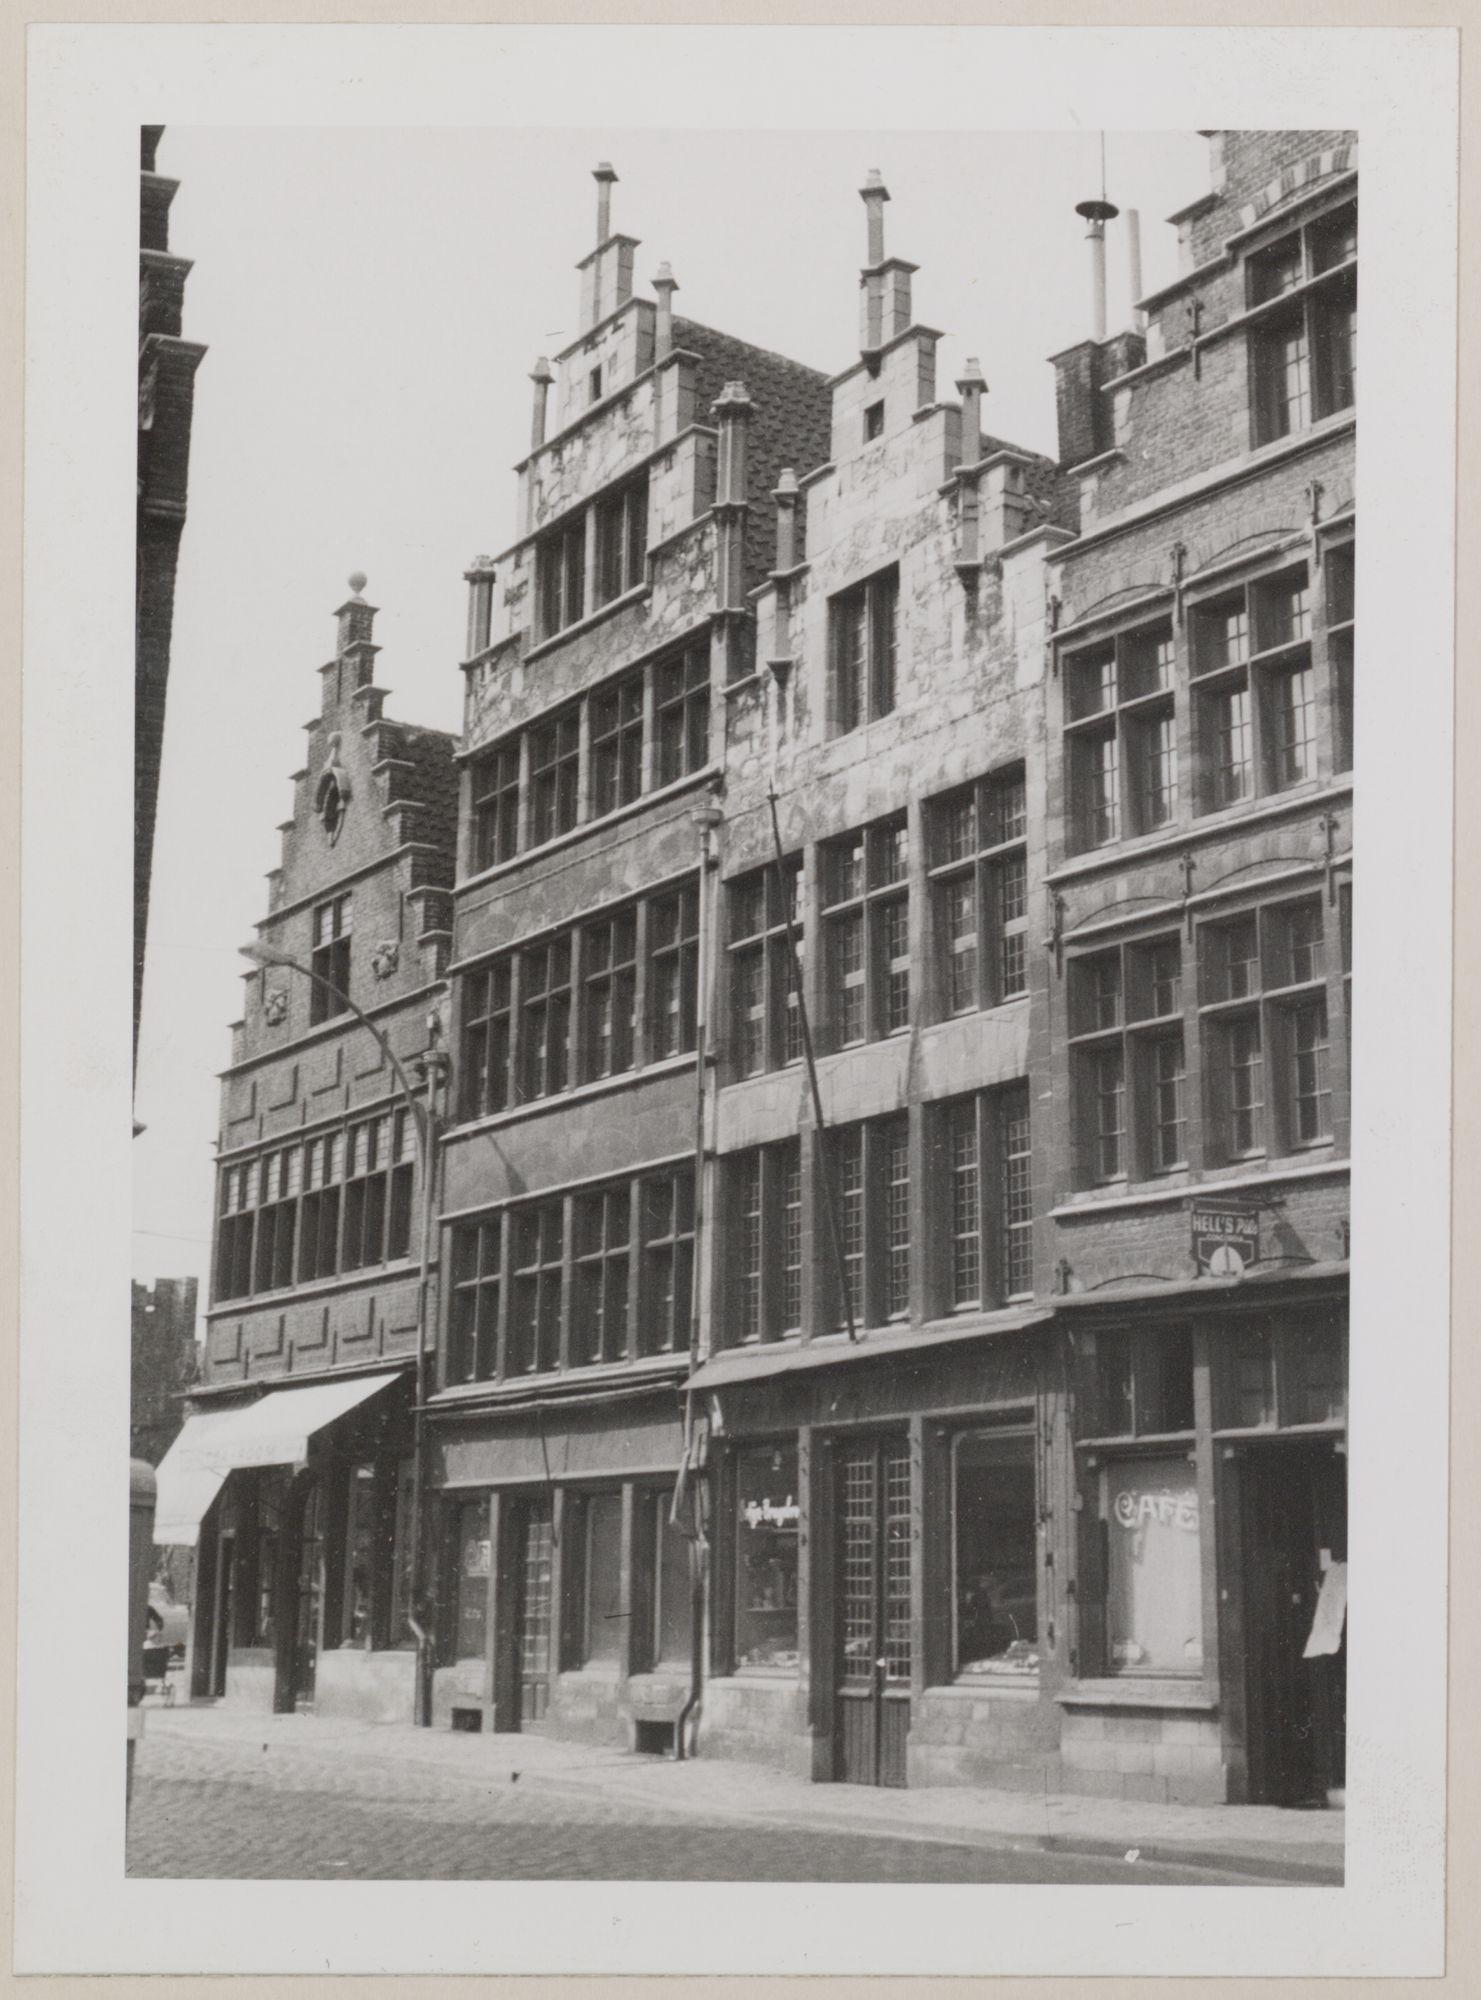 Gent: Trapgevelhuizen, Kraanlei